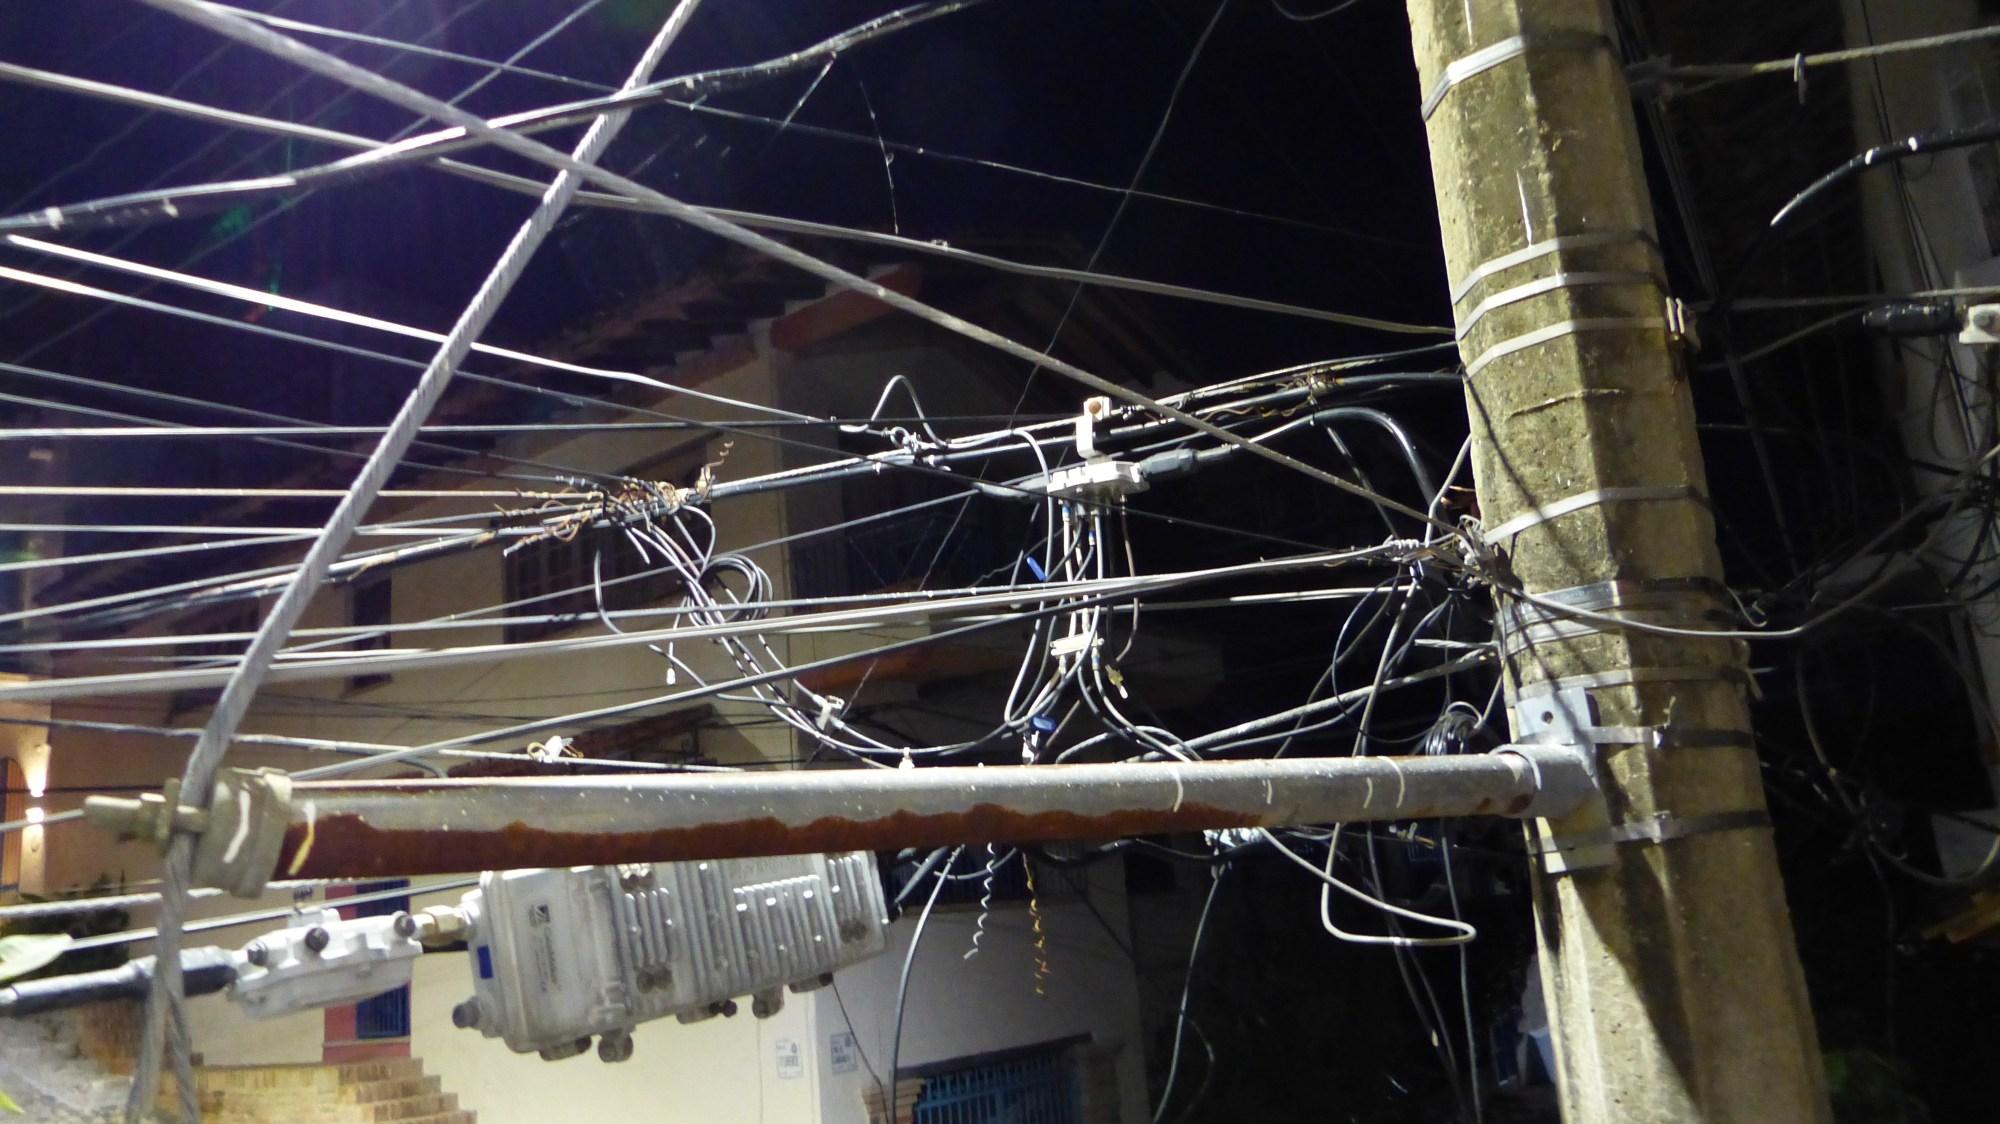 hight resolution of wires near my condo balcony in puerto vallarta